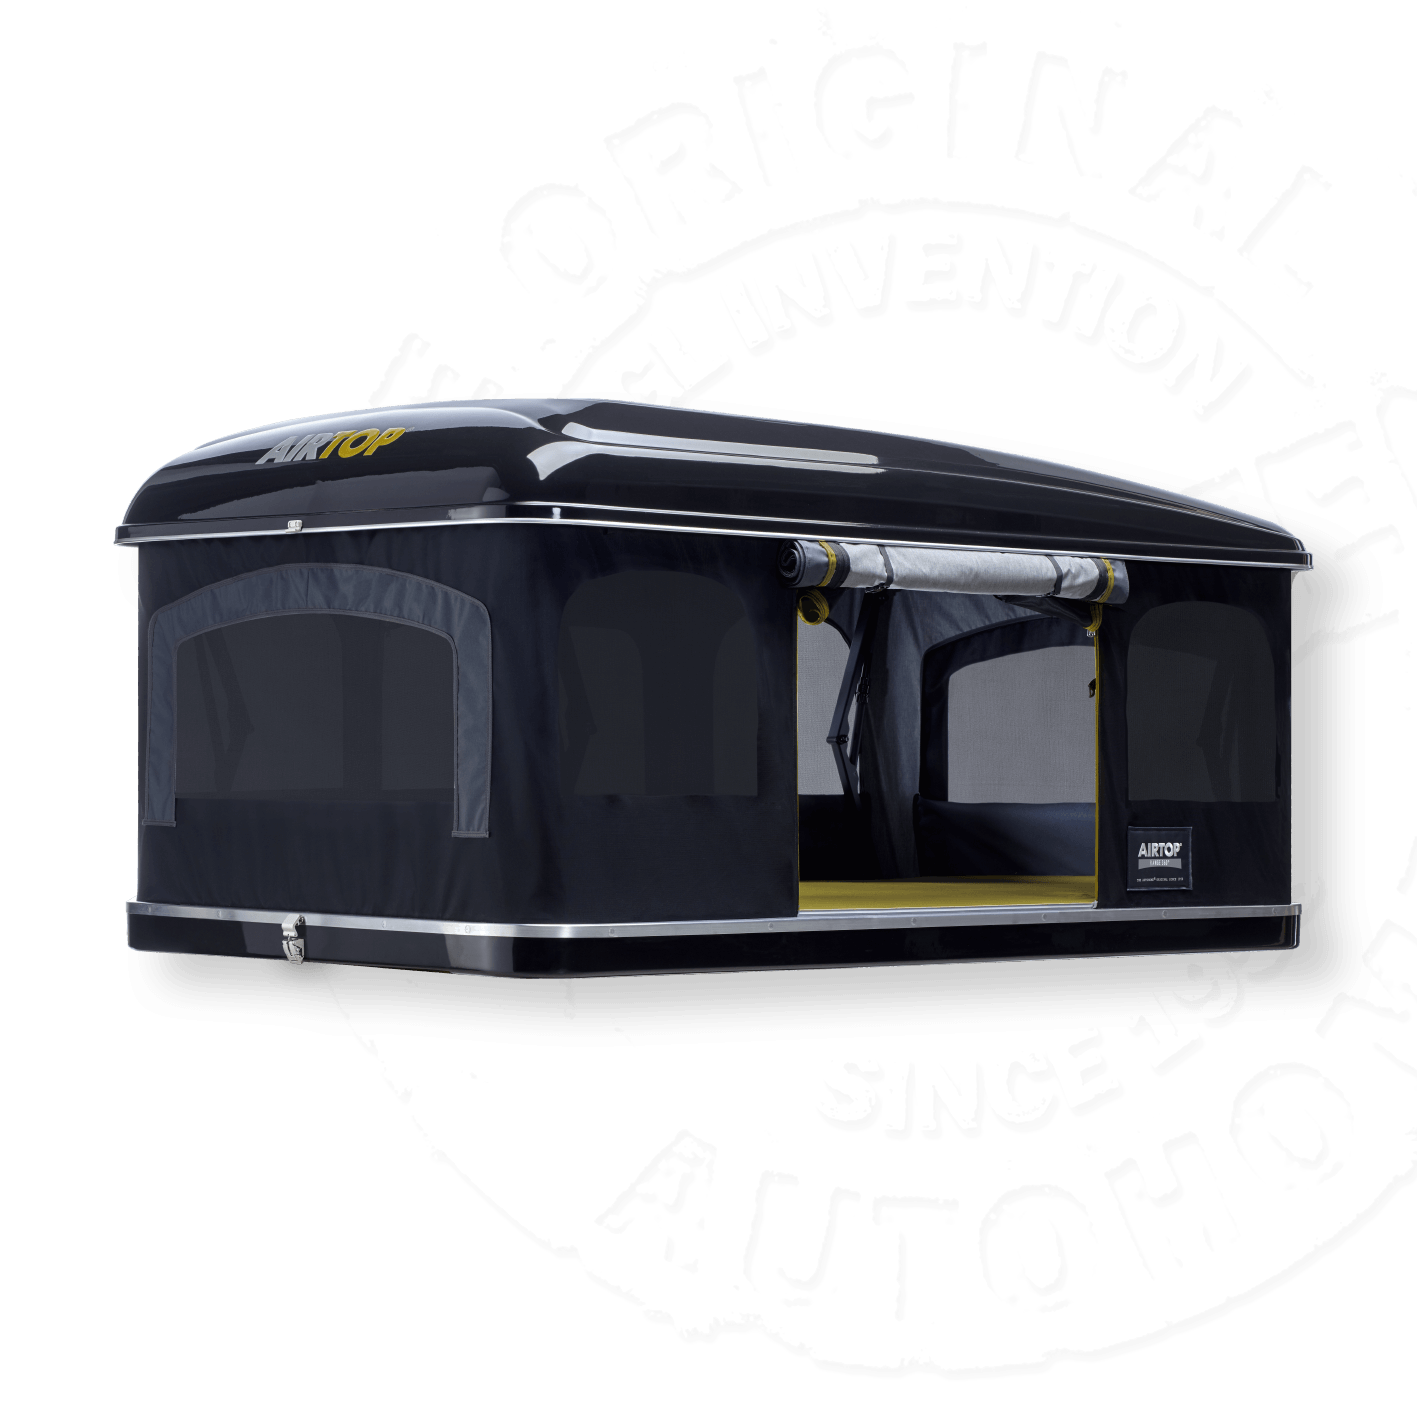 Blackstorm Airtop Prospective - Roof Top Tents by Autohome